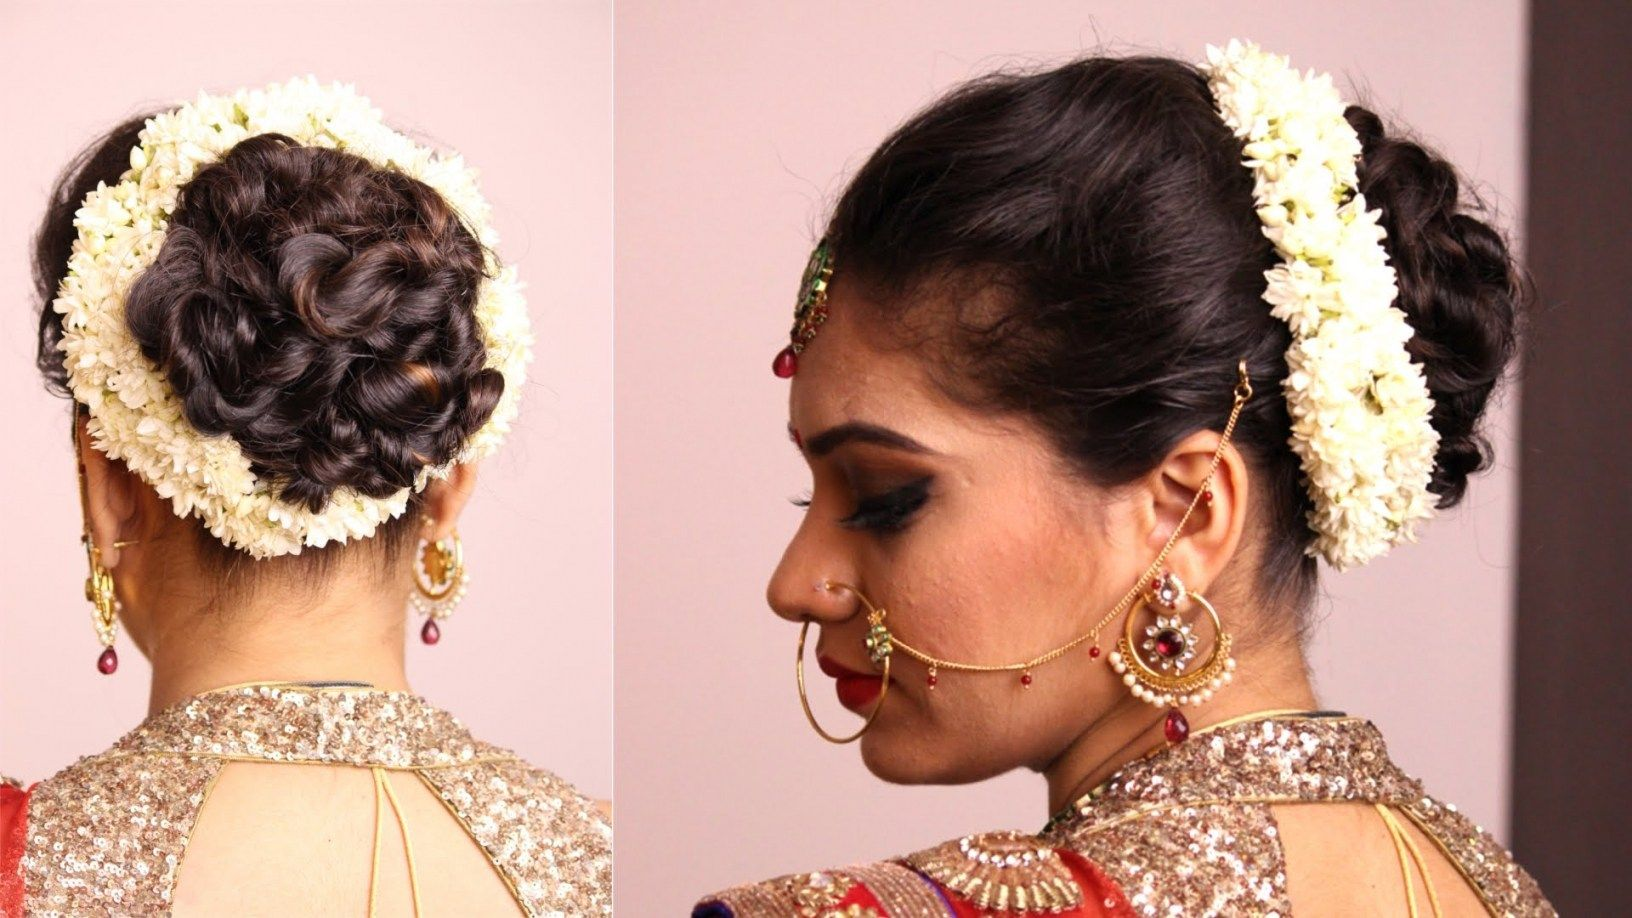 maharashtrian bridal hairstyles for long hair | hairstyles